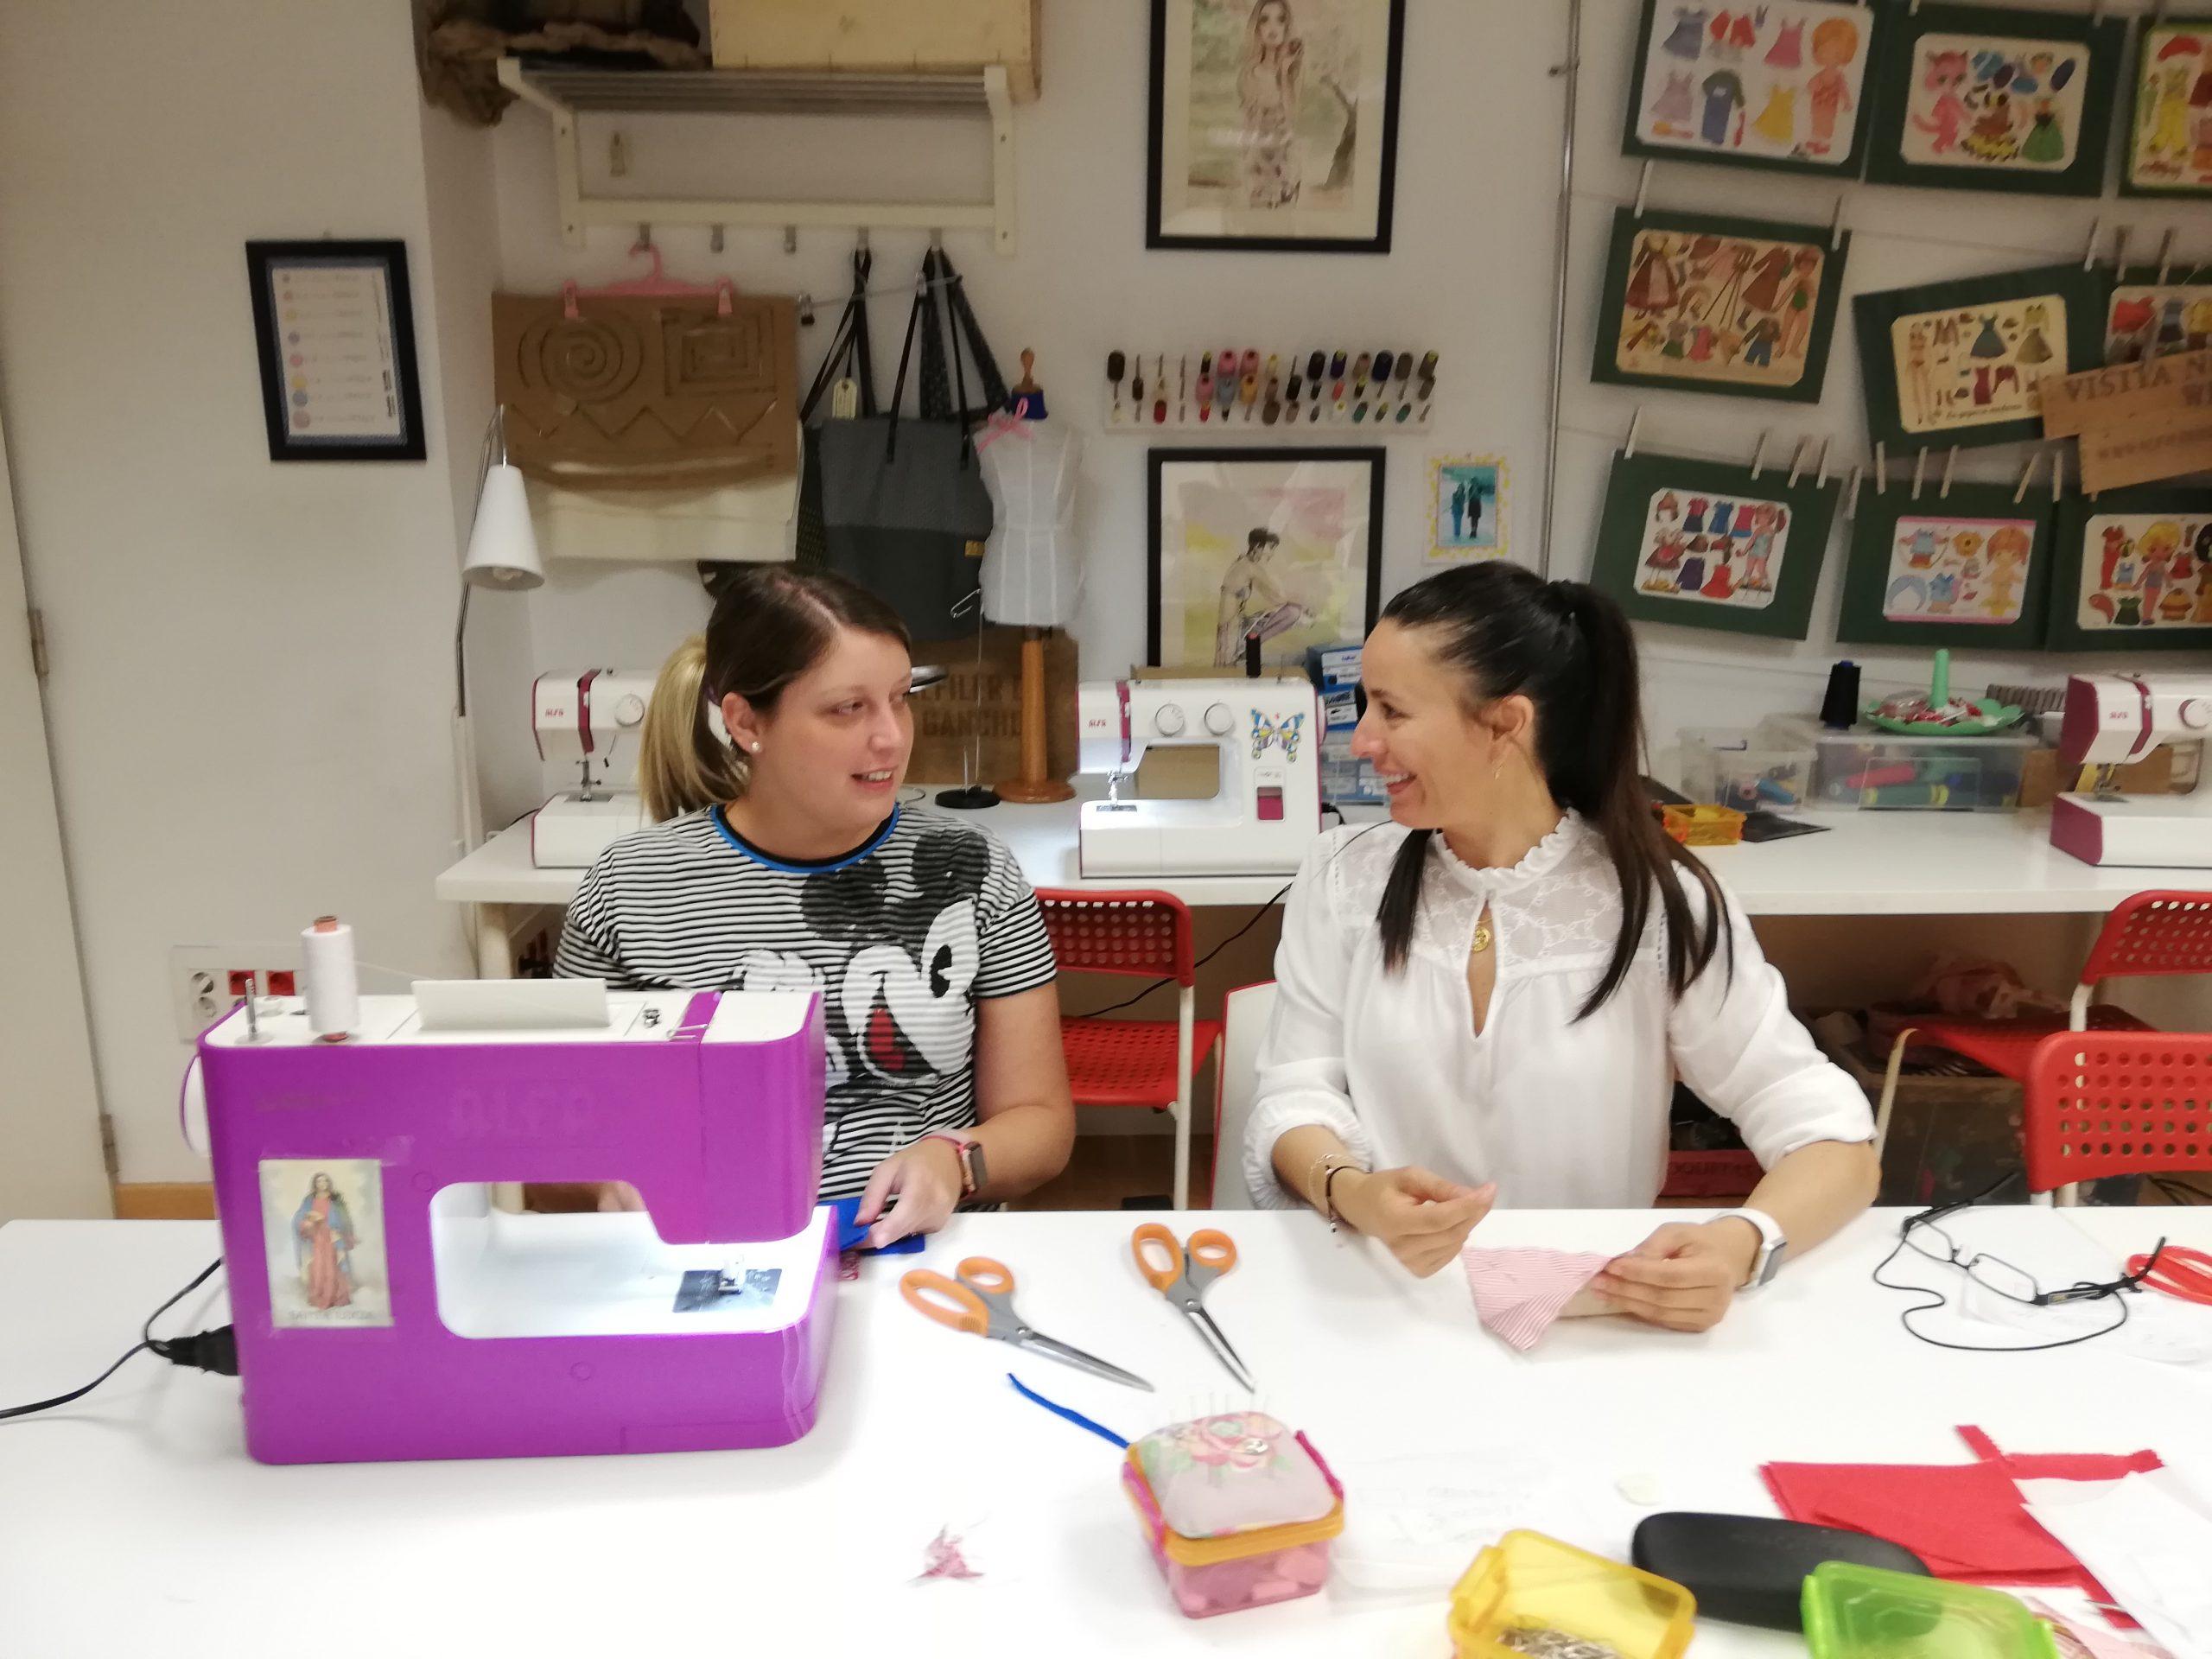 curso de iniciacion a la costura en zaragozz